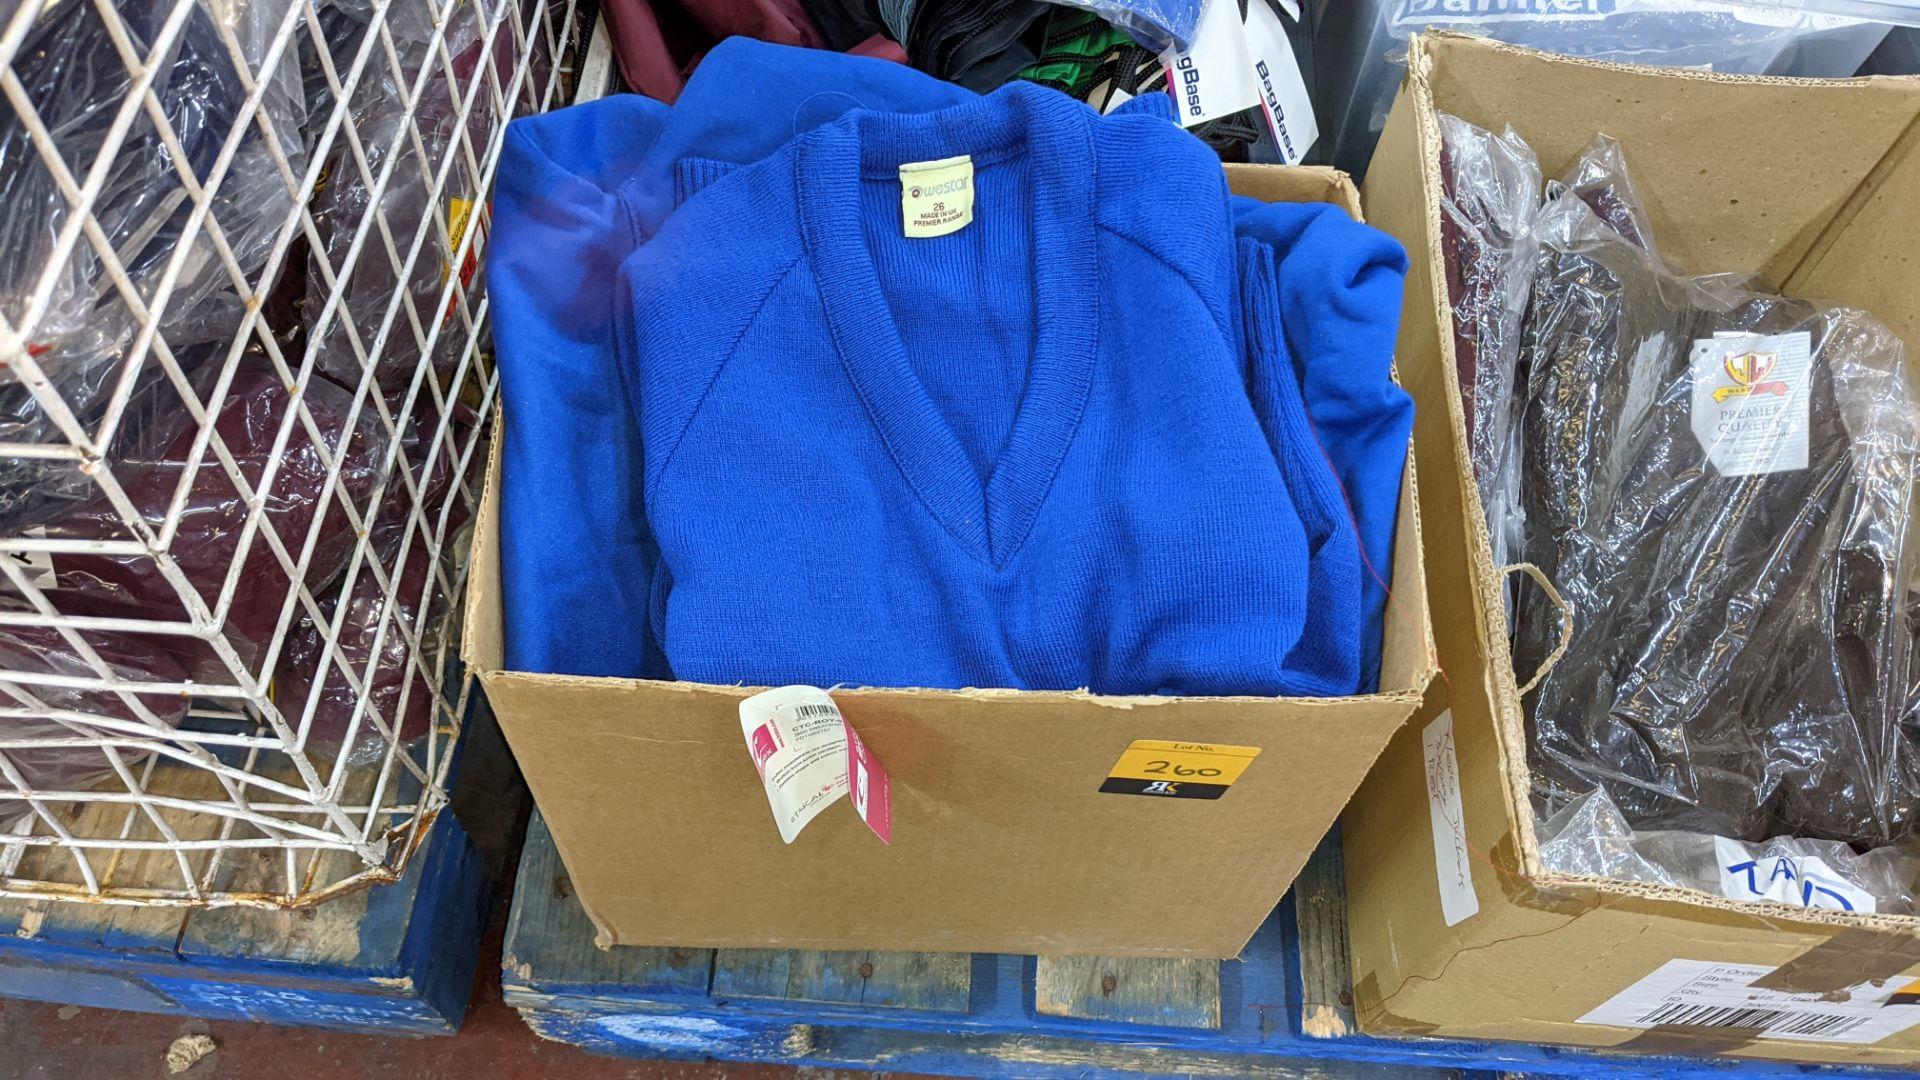 Box of blue V neck children's sweatshirts & button up tops